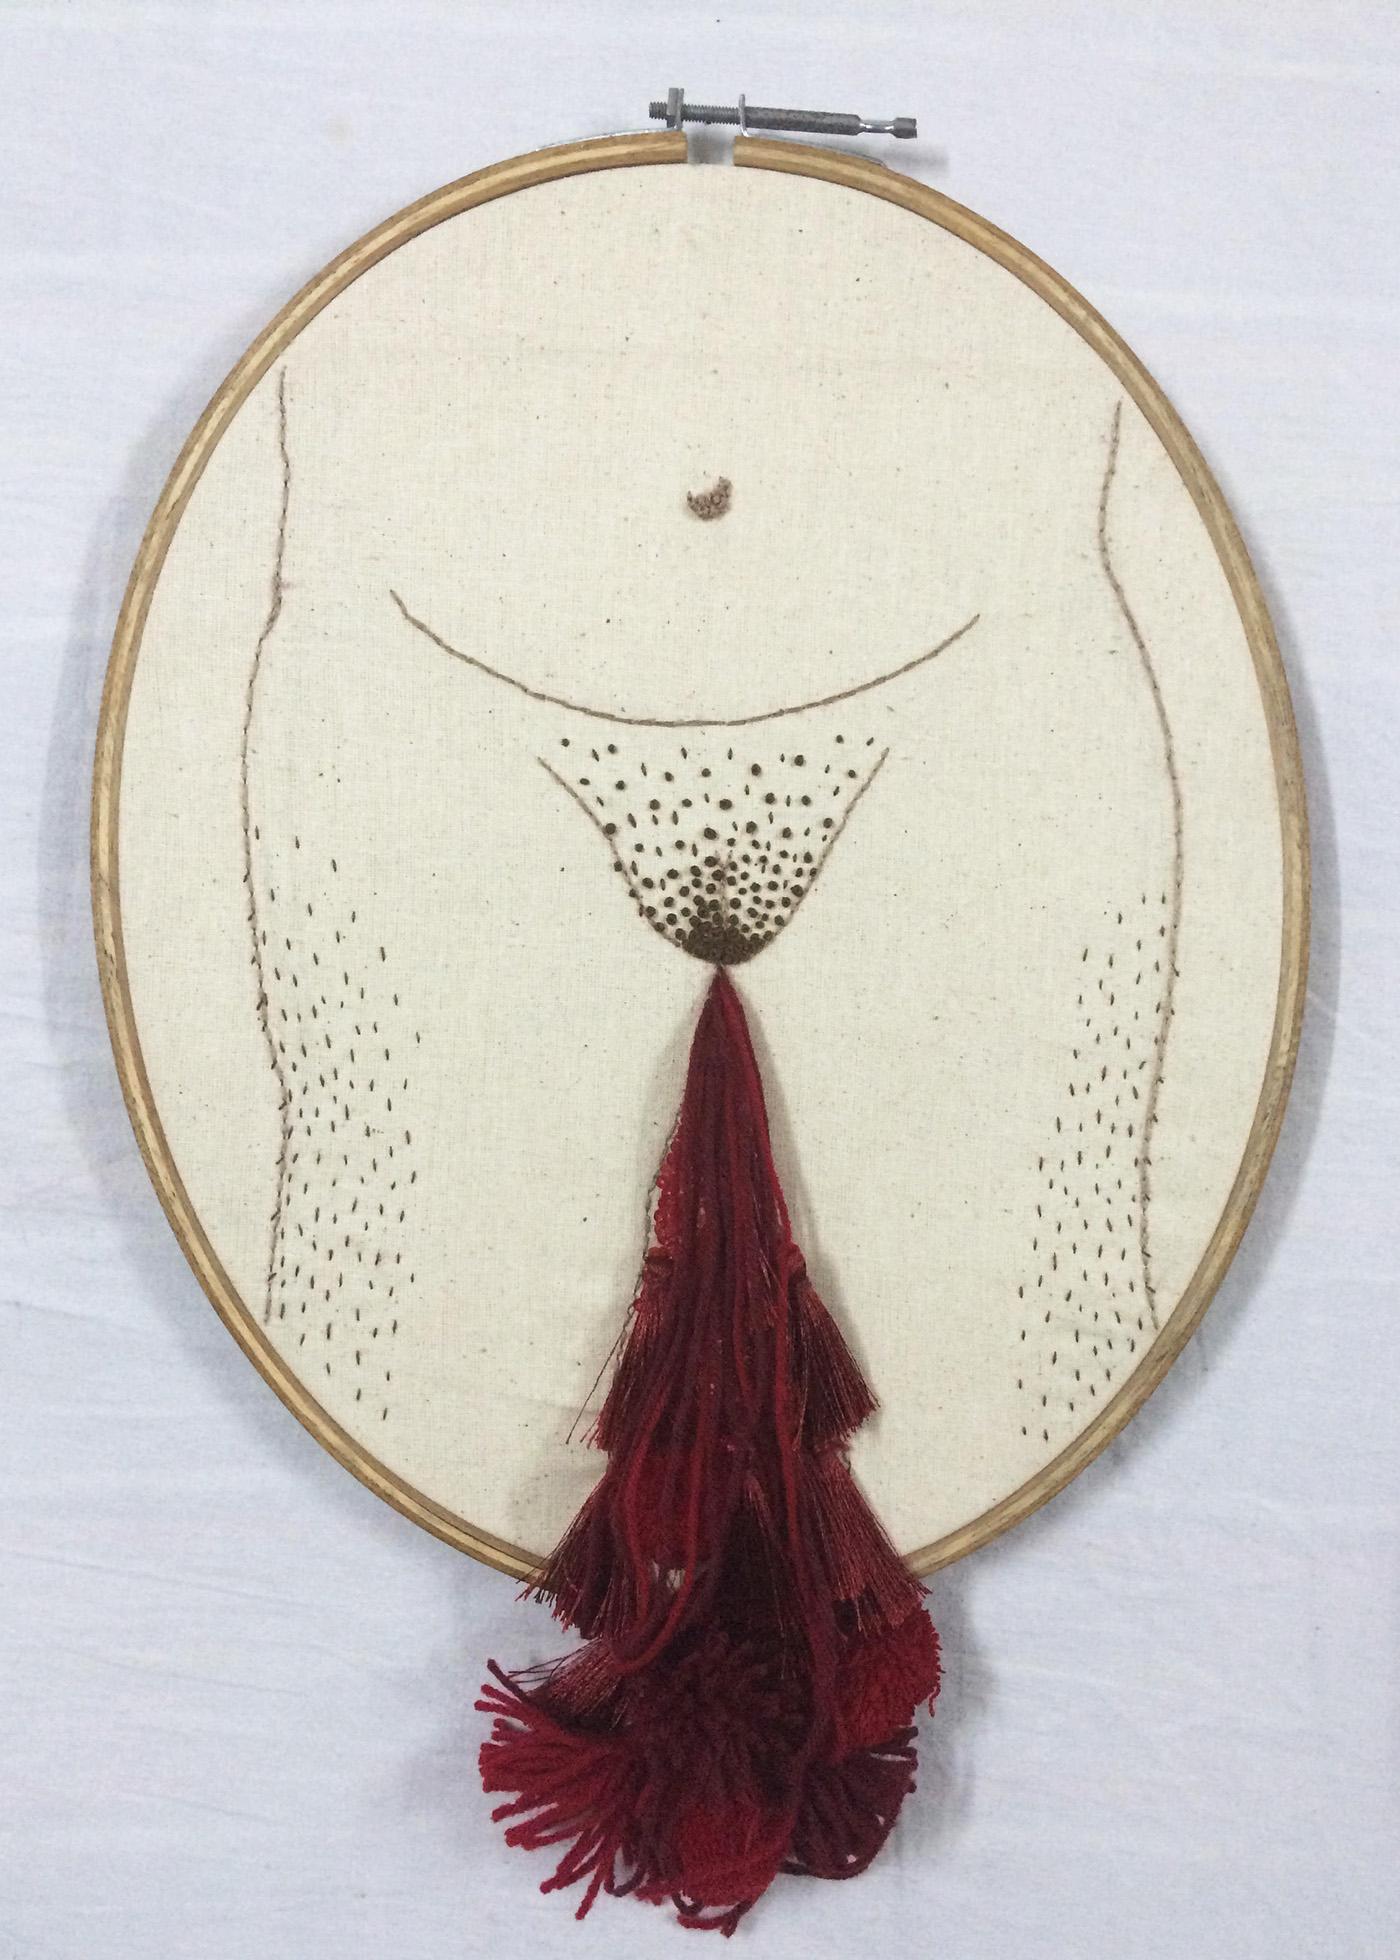 feminism female body Body Positivity normalize menstruation